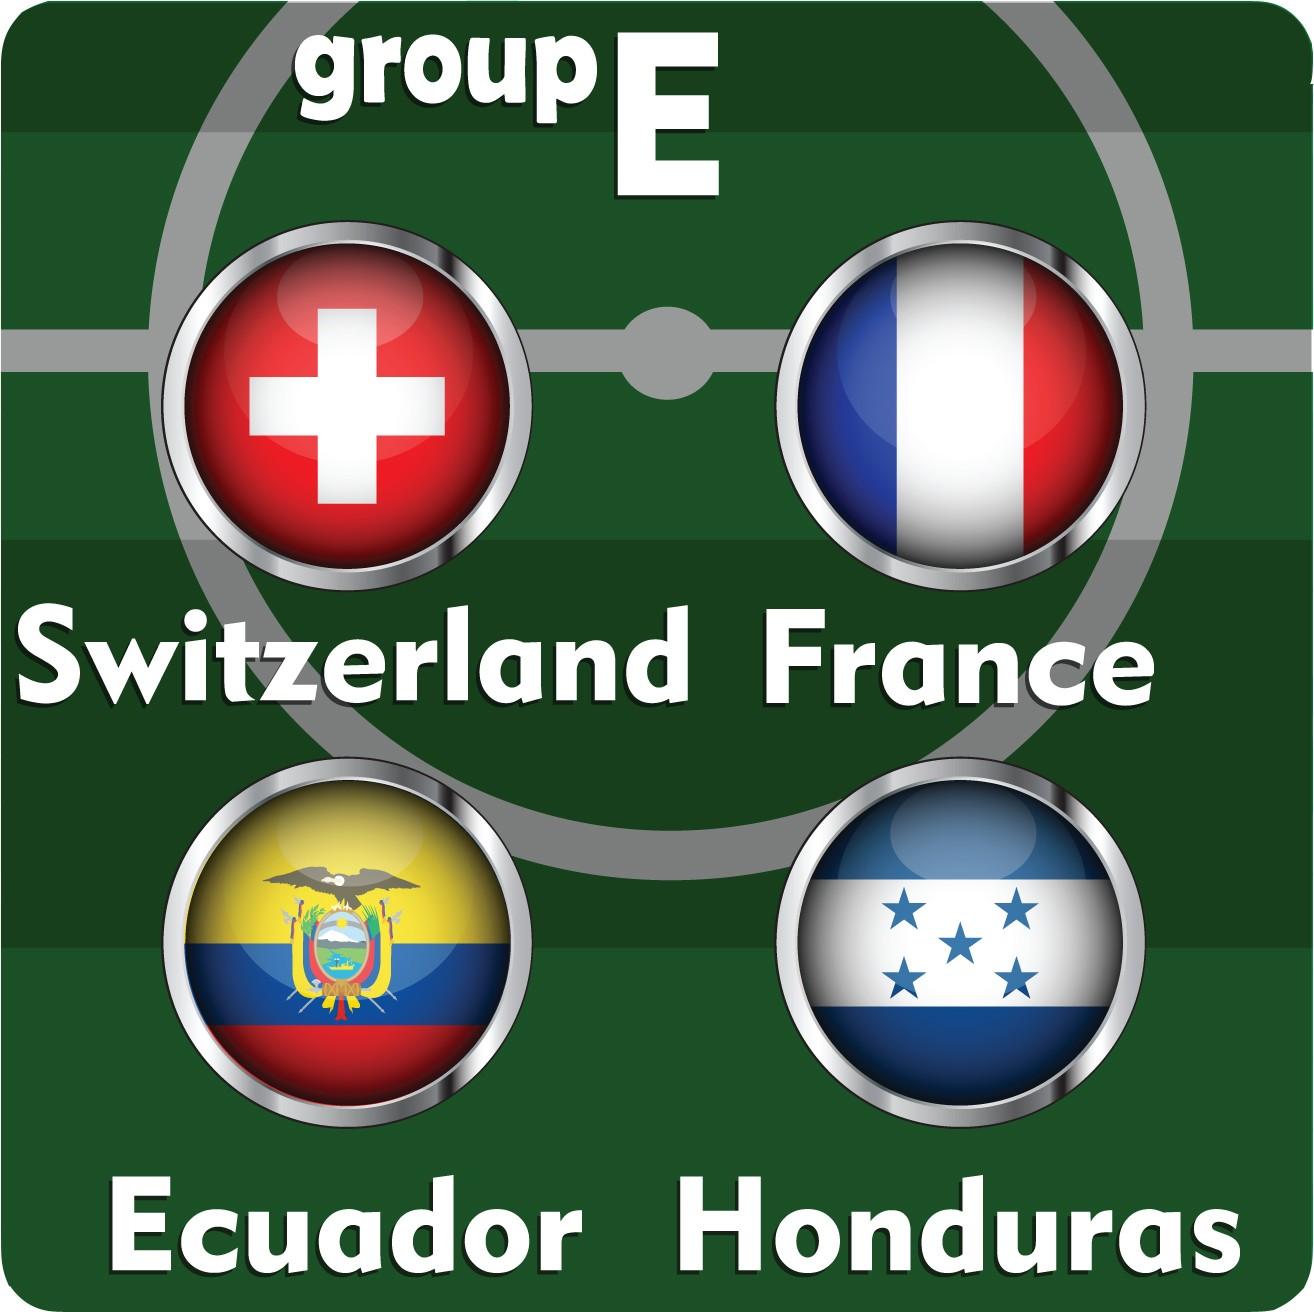 2014fifaworldcupbrazil.-Group-E-Ecuador-France-Honduras-Switzerland.jpg